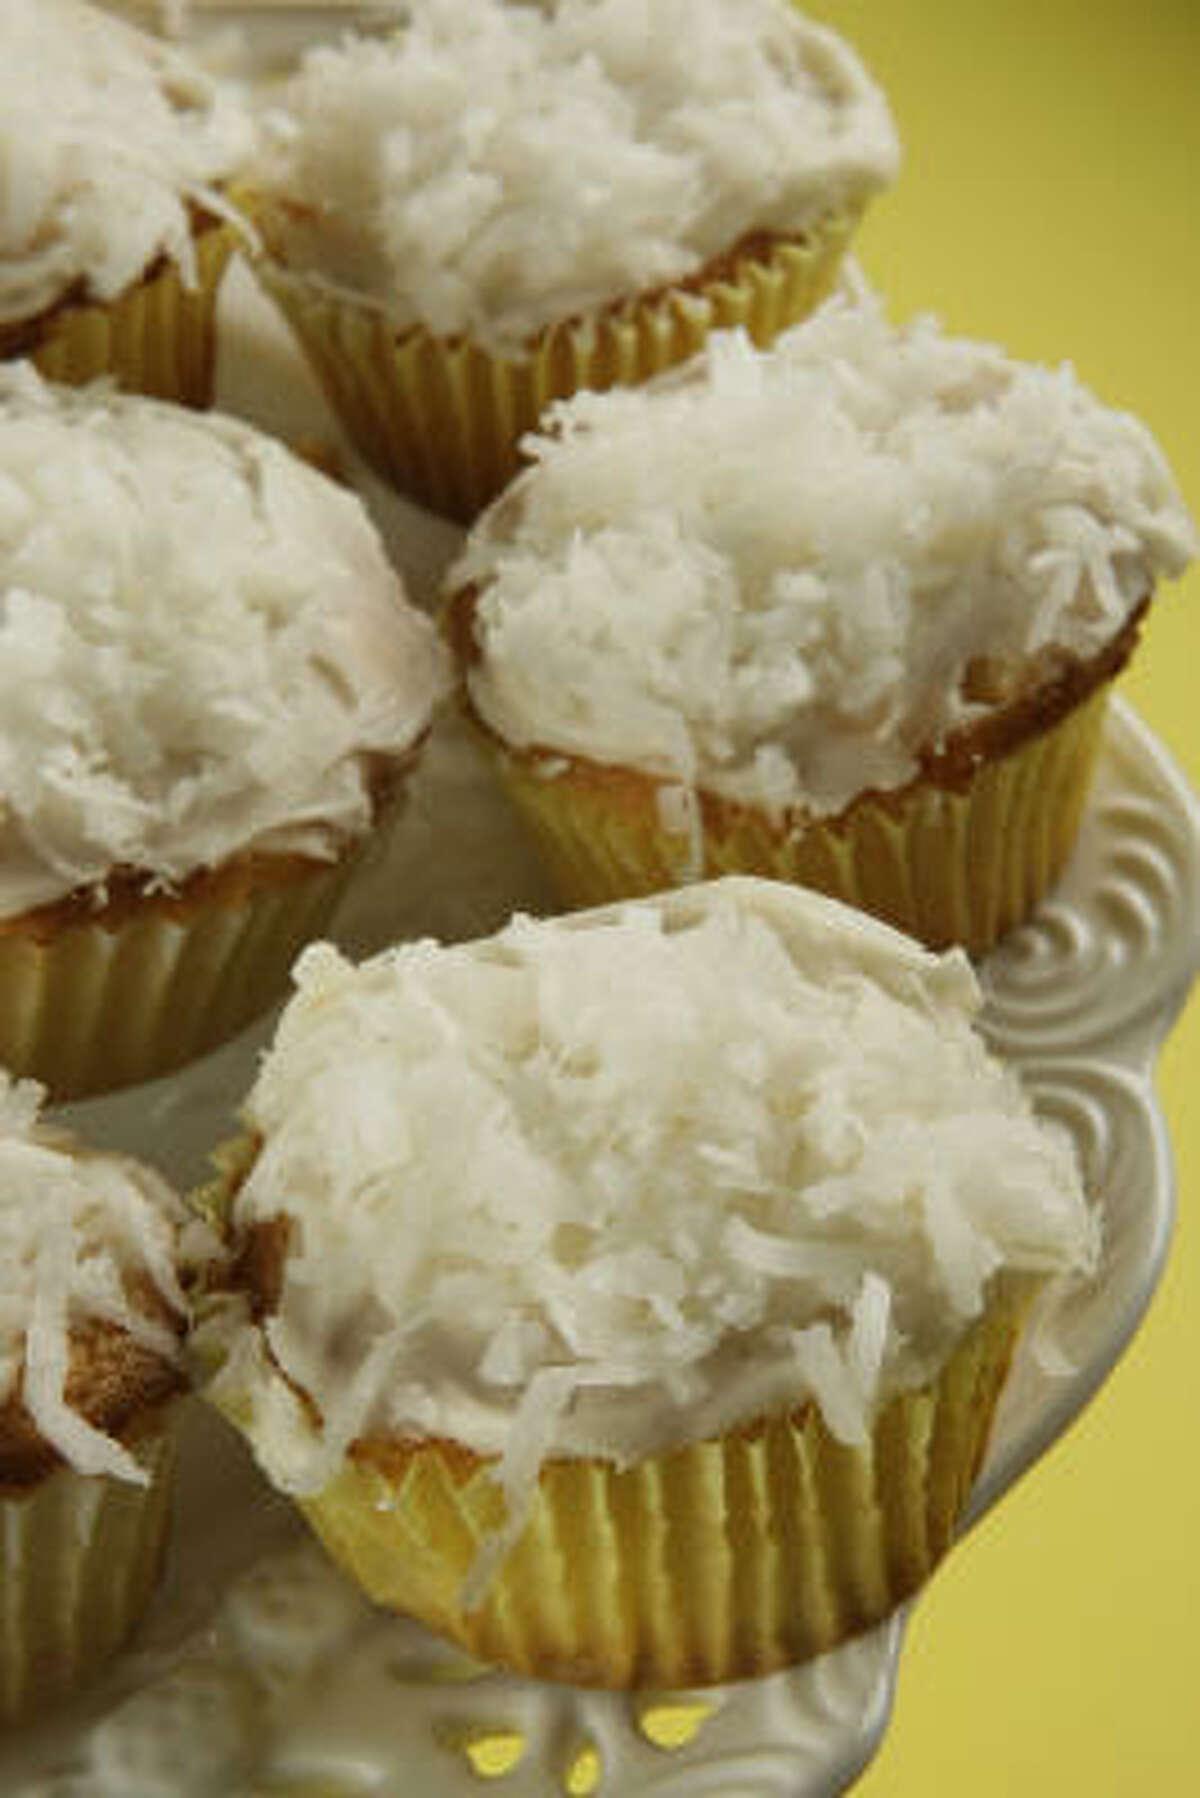 Coconut-Filled Lemon Cupcakes